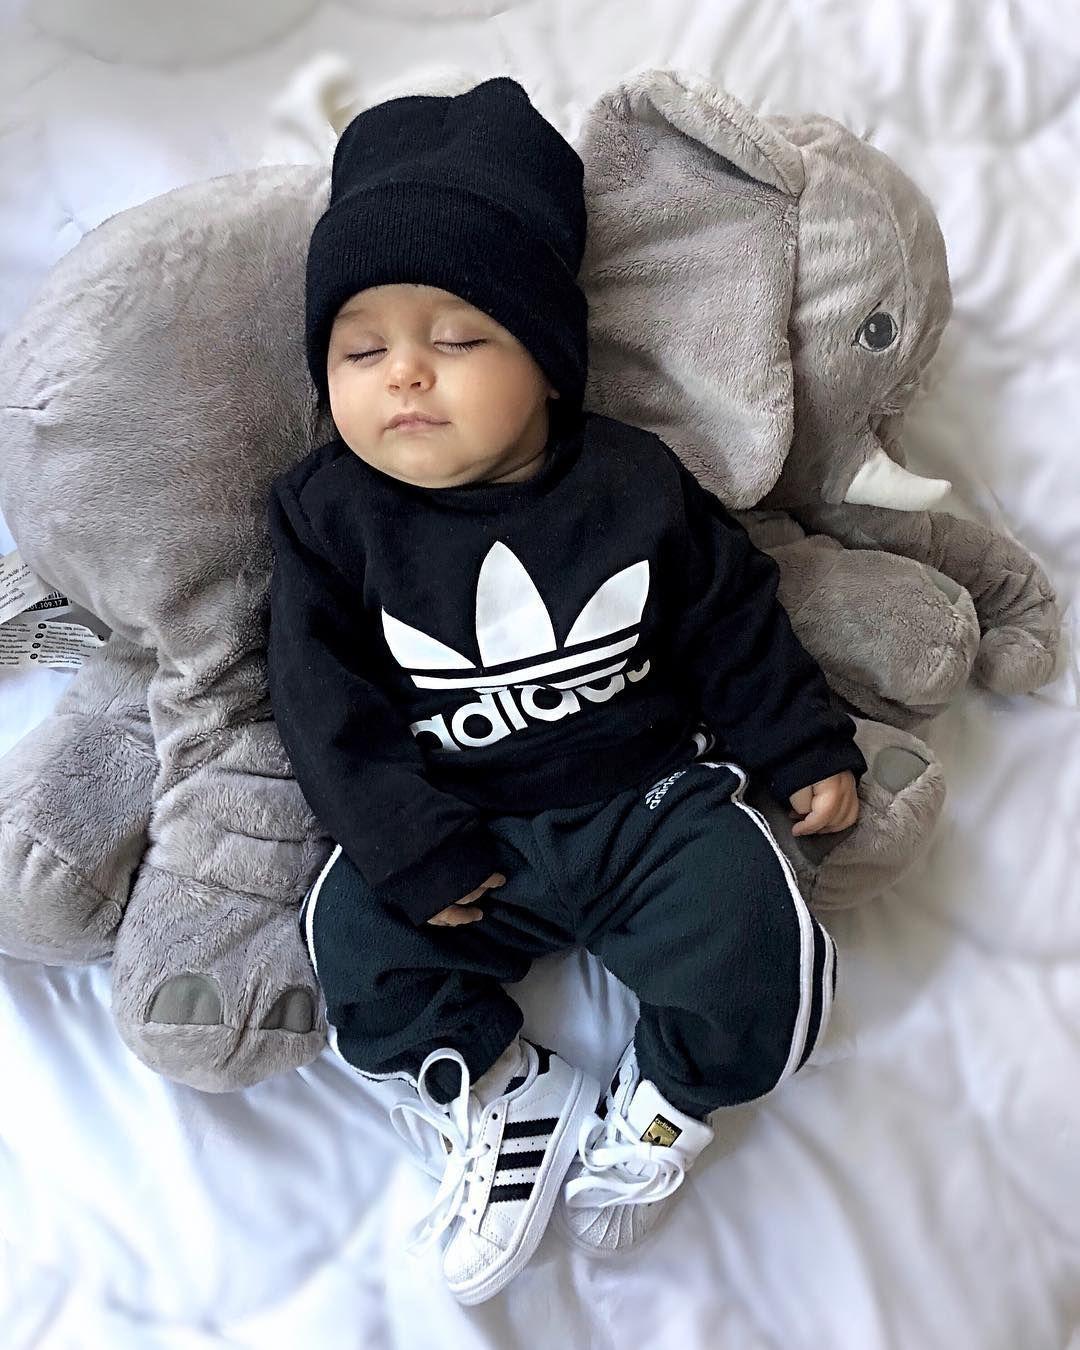 🖤 kidswag #babyboynewborn #babykids #babyboyfashion #kidsfashion #kidstyles -   🖤 kidswag #babyboynewborn #babykids #babyboyfashion #kidsfashion #kidstyles  -   ?  Homepage